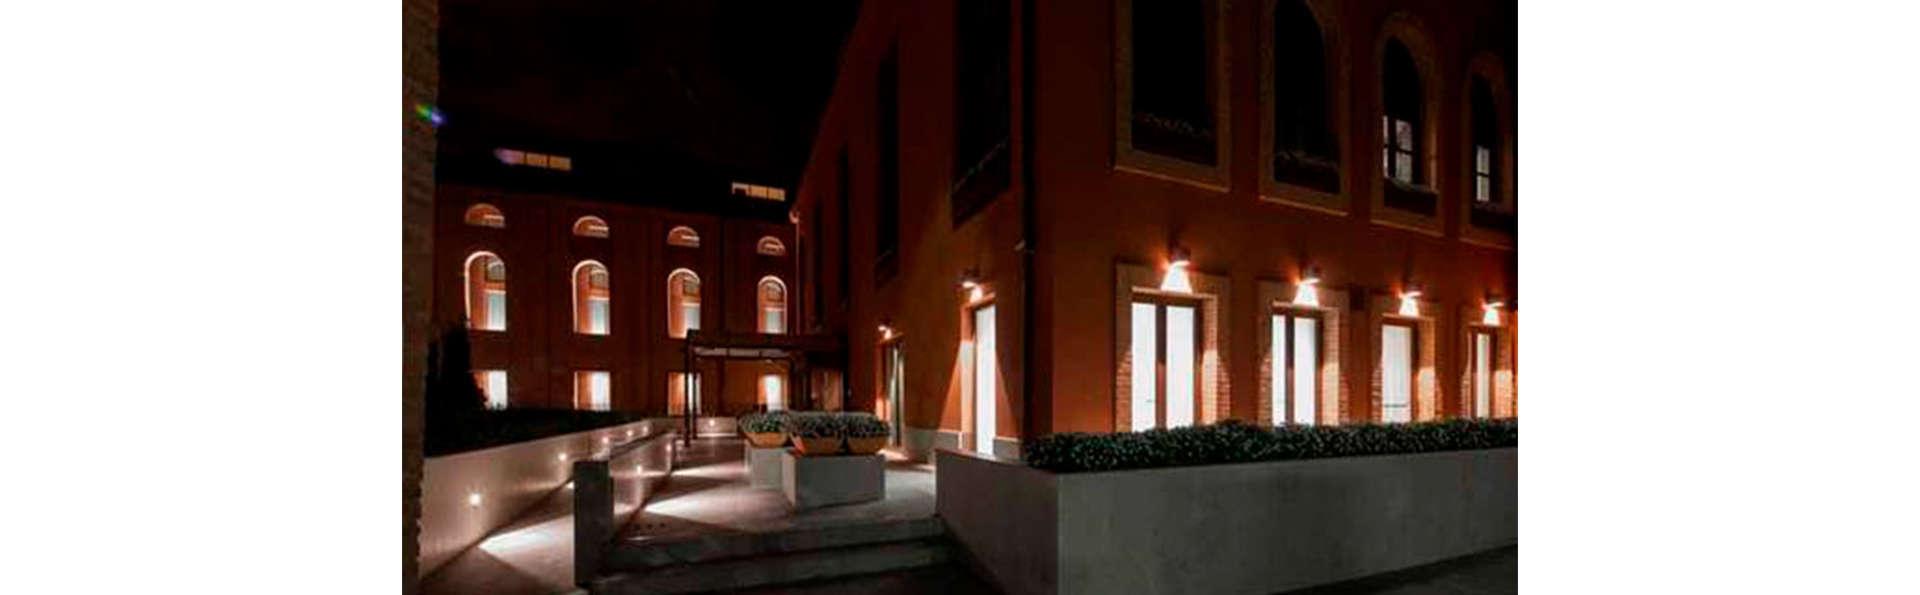 Hotel MGallery LaGare - EDIT_N_FRONT.jpg